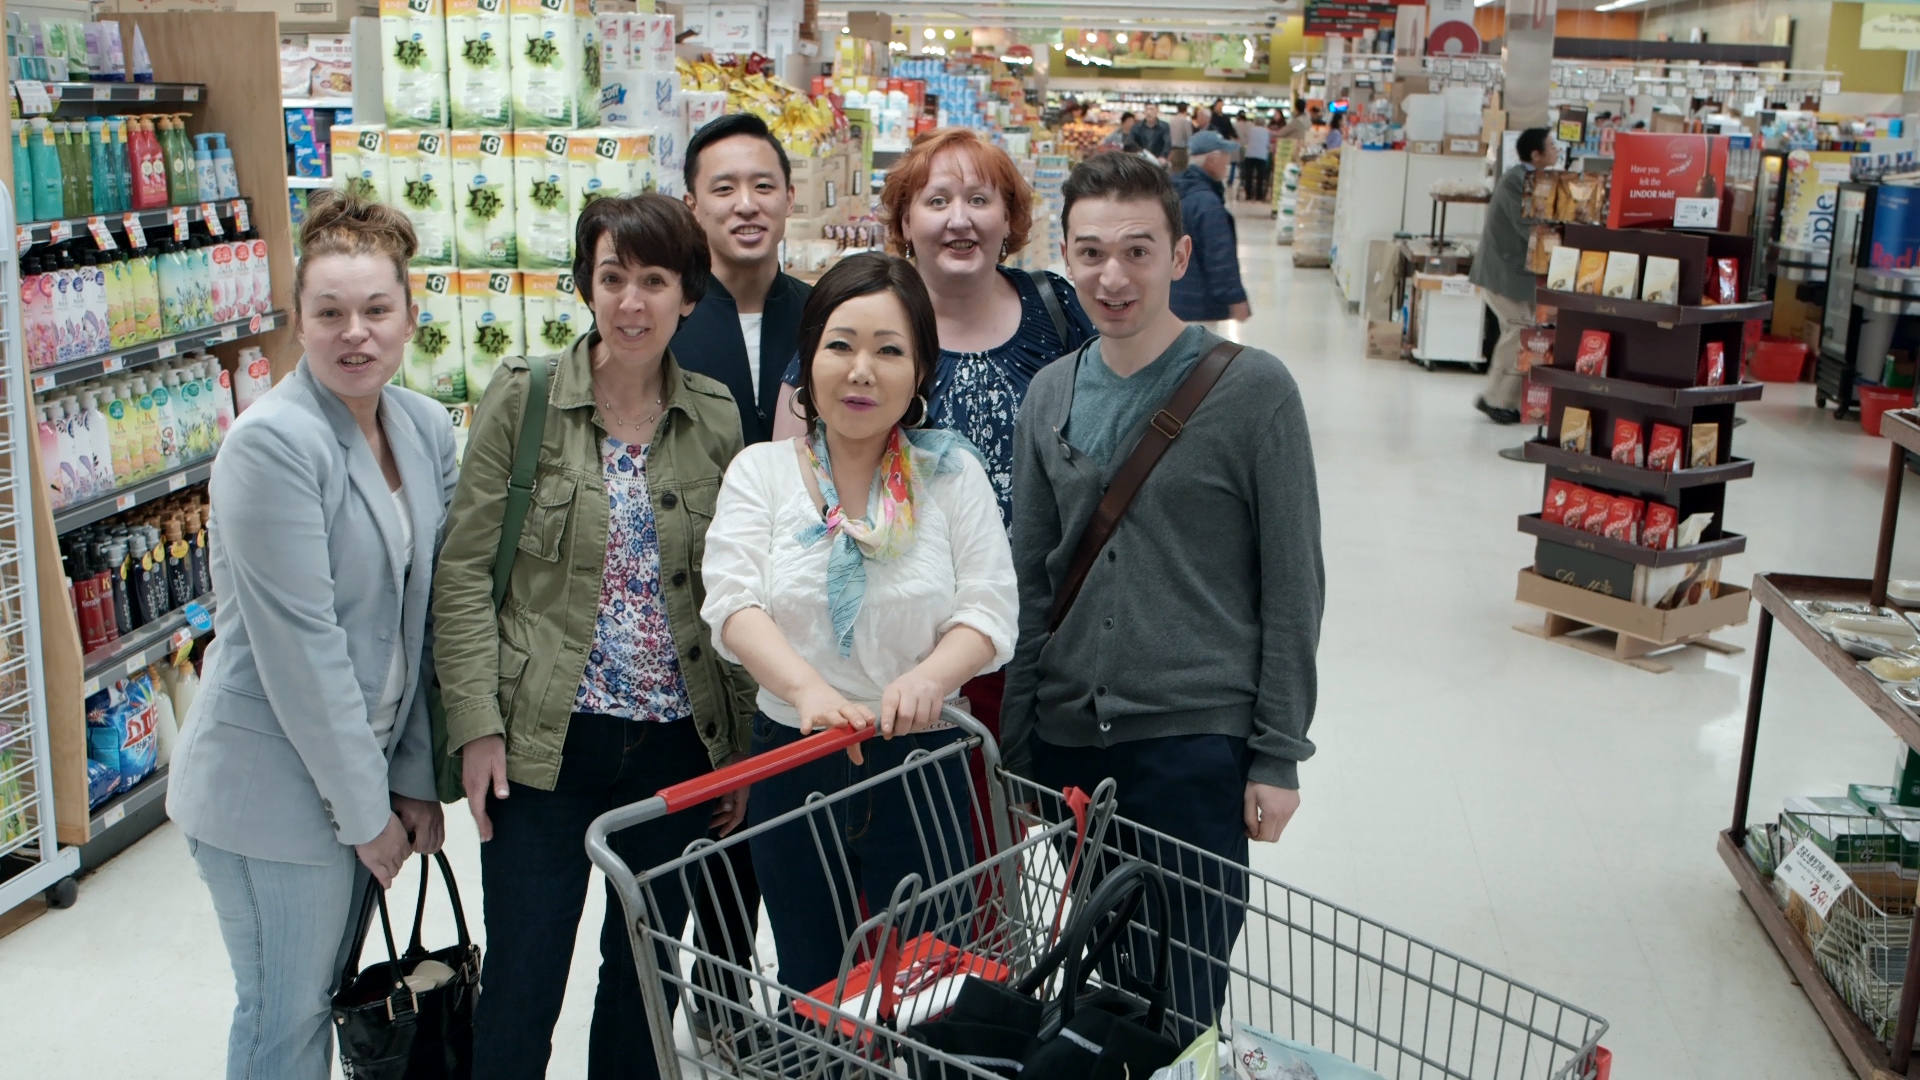 Korean grocery store walkthrough